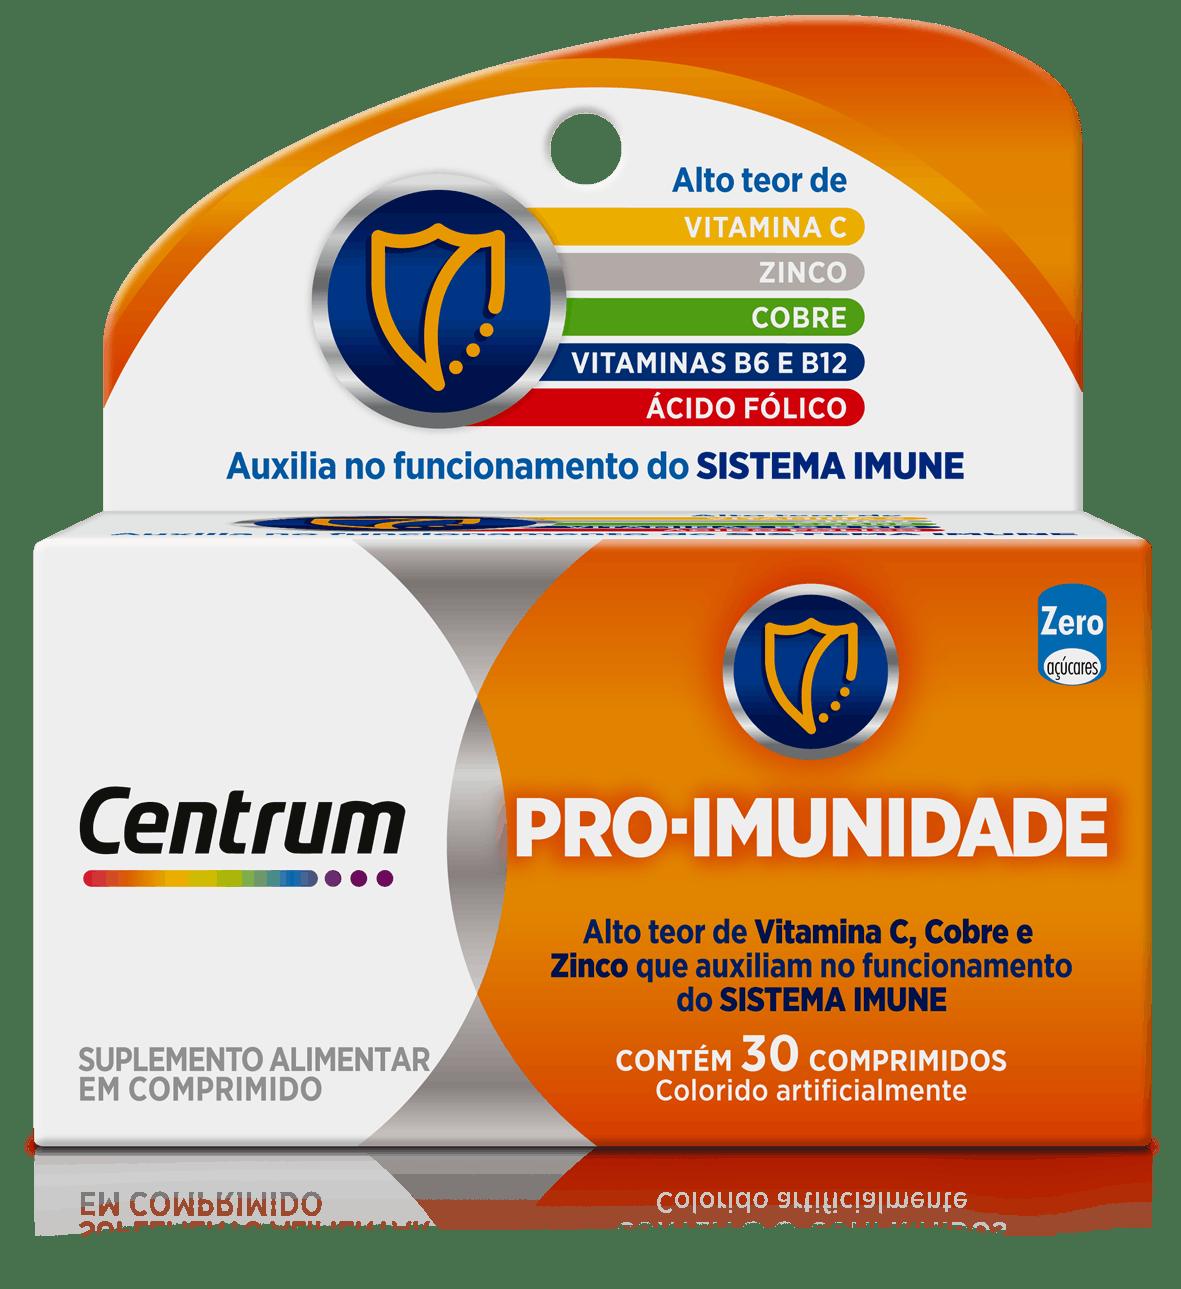 Box of Centrum Pro-Imunidade